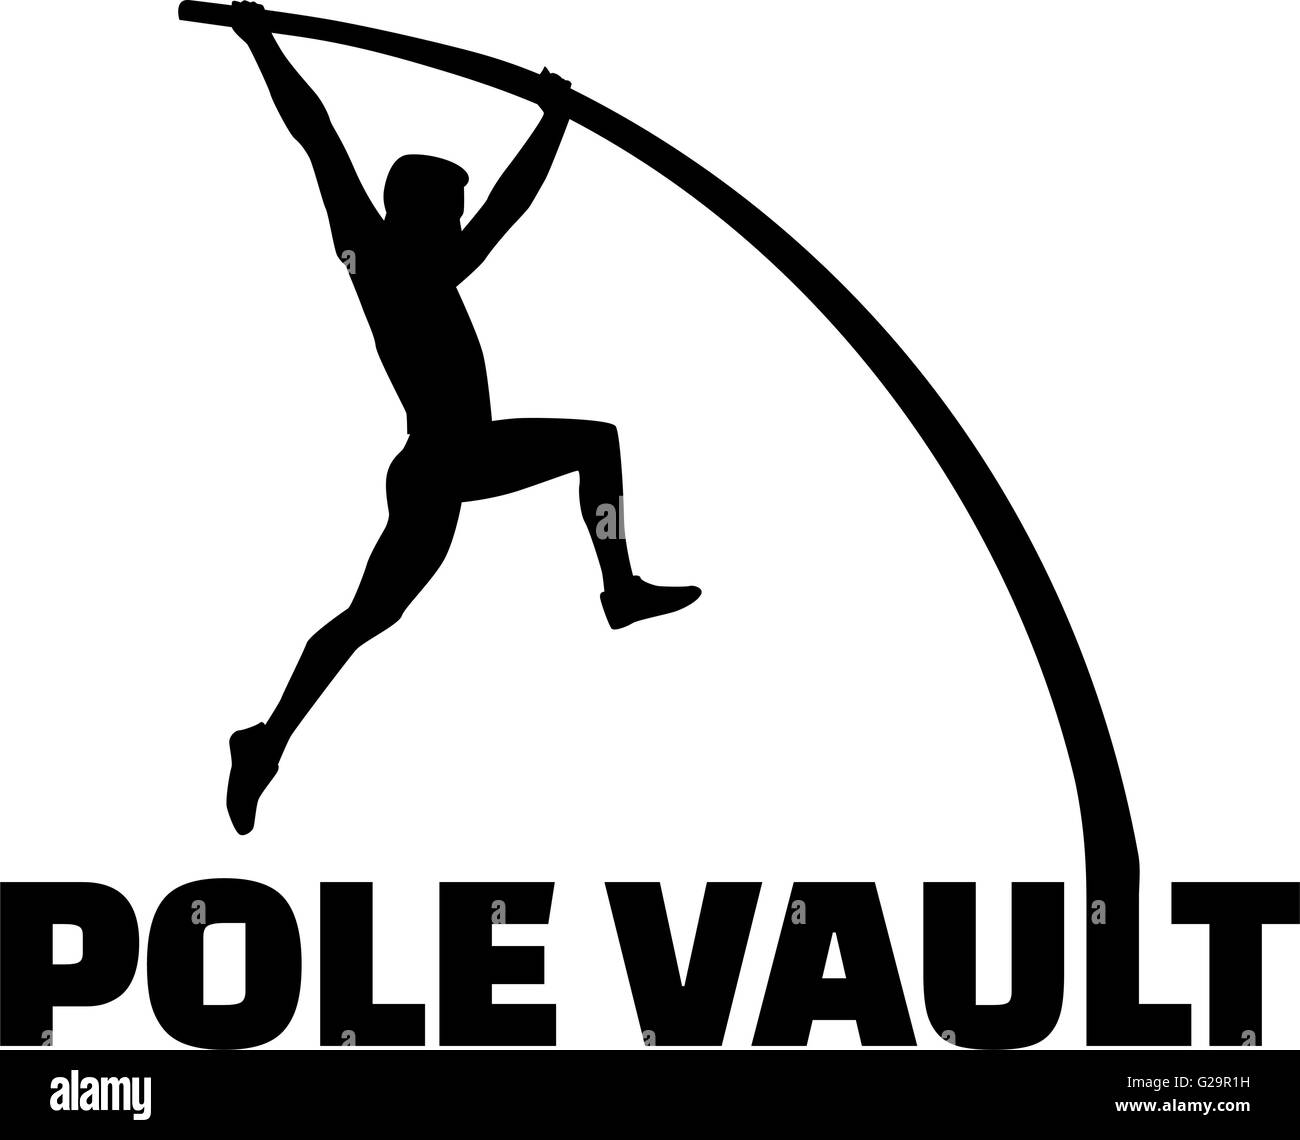 Pole vaulter with flexible pole - Stock Vector